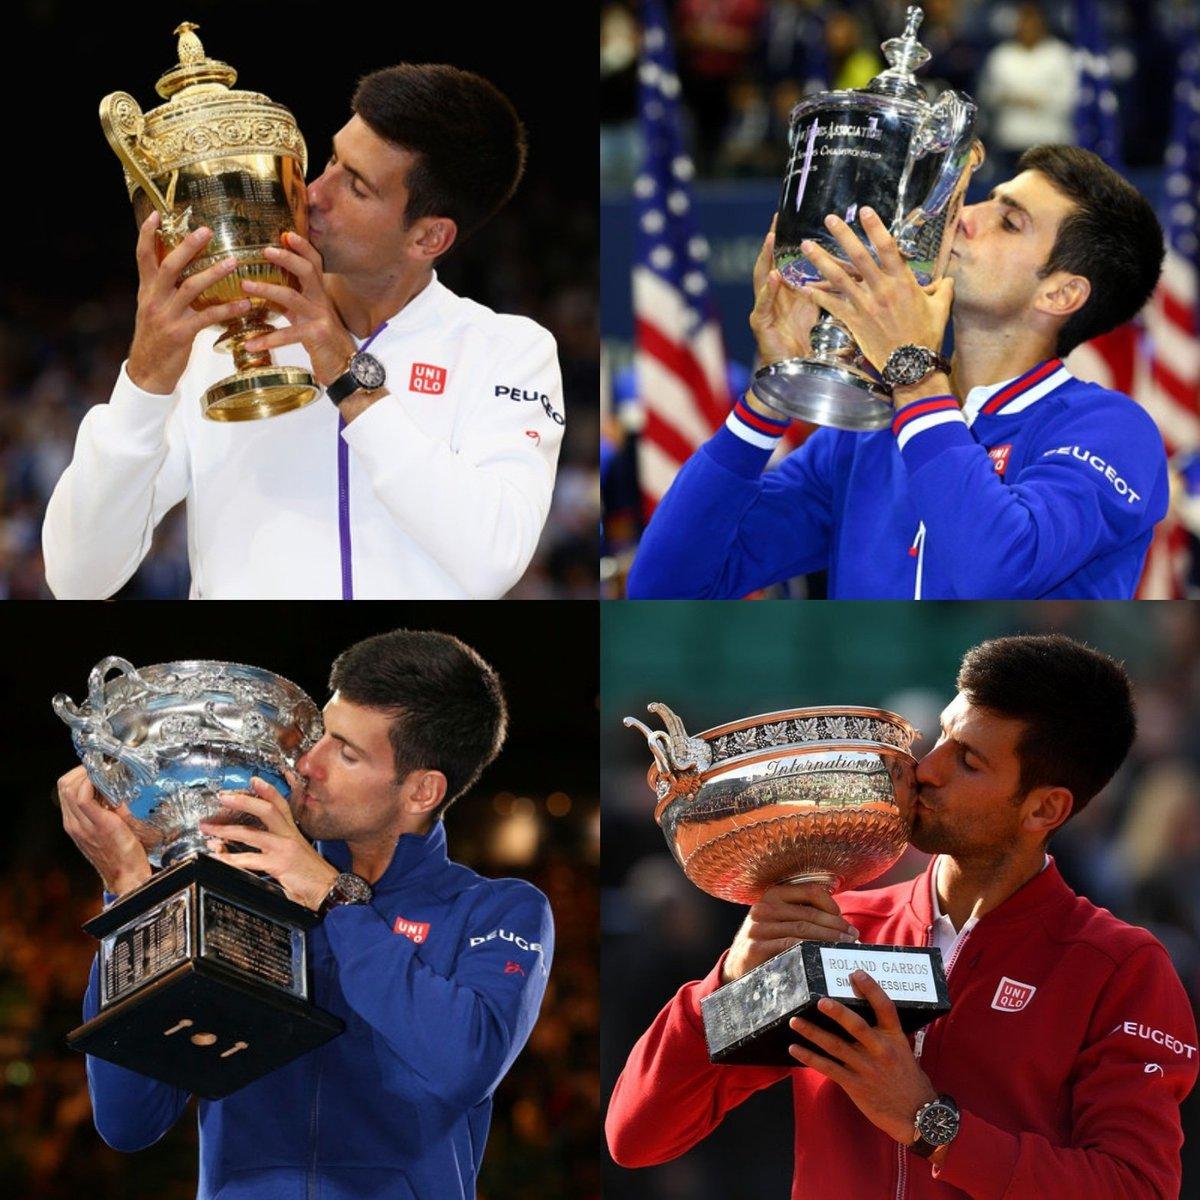 En 2016, Novak #Djokovic se convirtió en el tercer hombre en la historia en conquistar cuatro títulos de #GrandSlam consecutivos.   🔹#Wimbledon 2015 🔹#USOpen 2015 🔹#AustralianOpen 2016 🔹#RolandGarros 2016  📸 Vía: Zimbio https://t.co/PrXLwHaQ4F